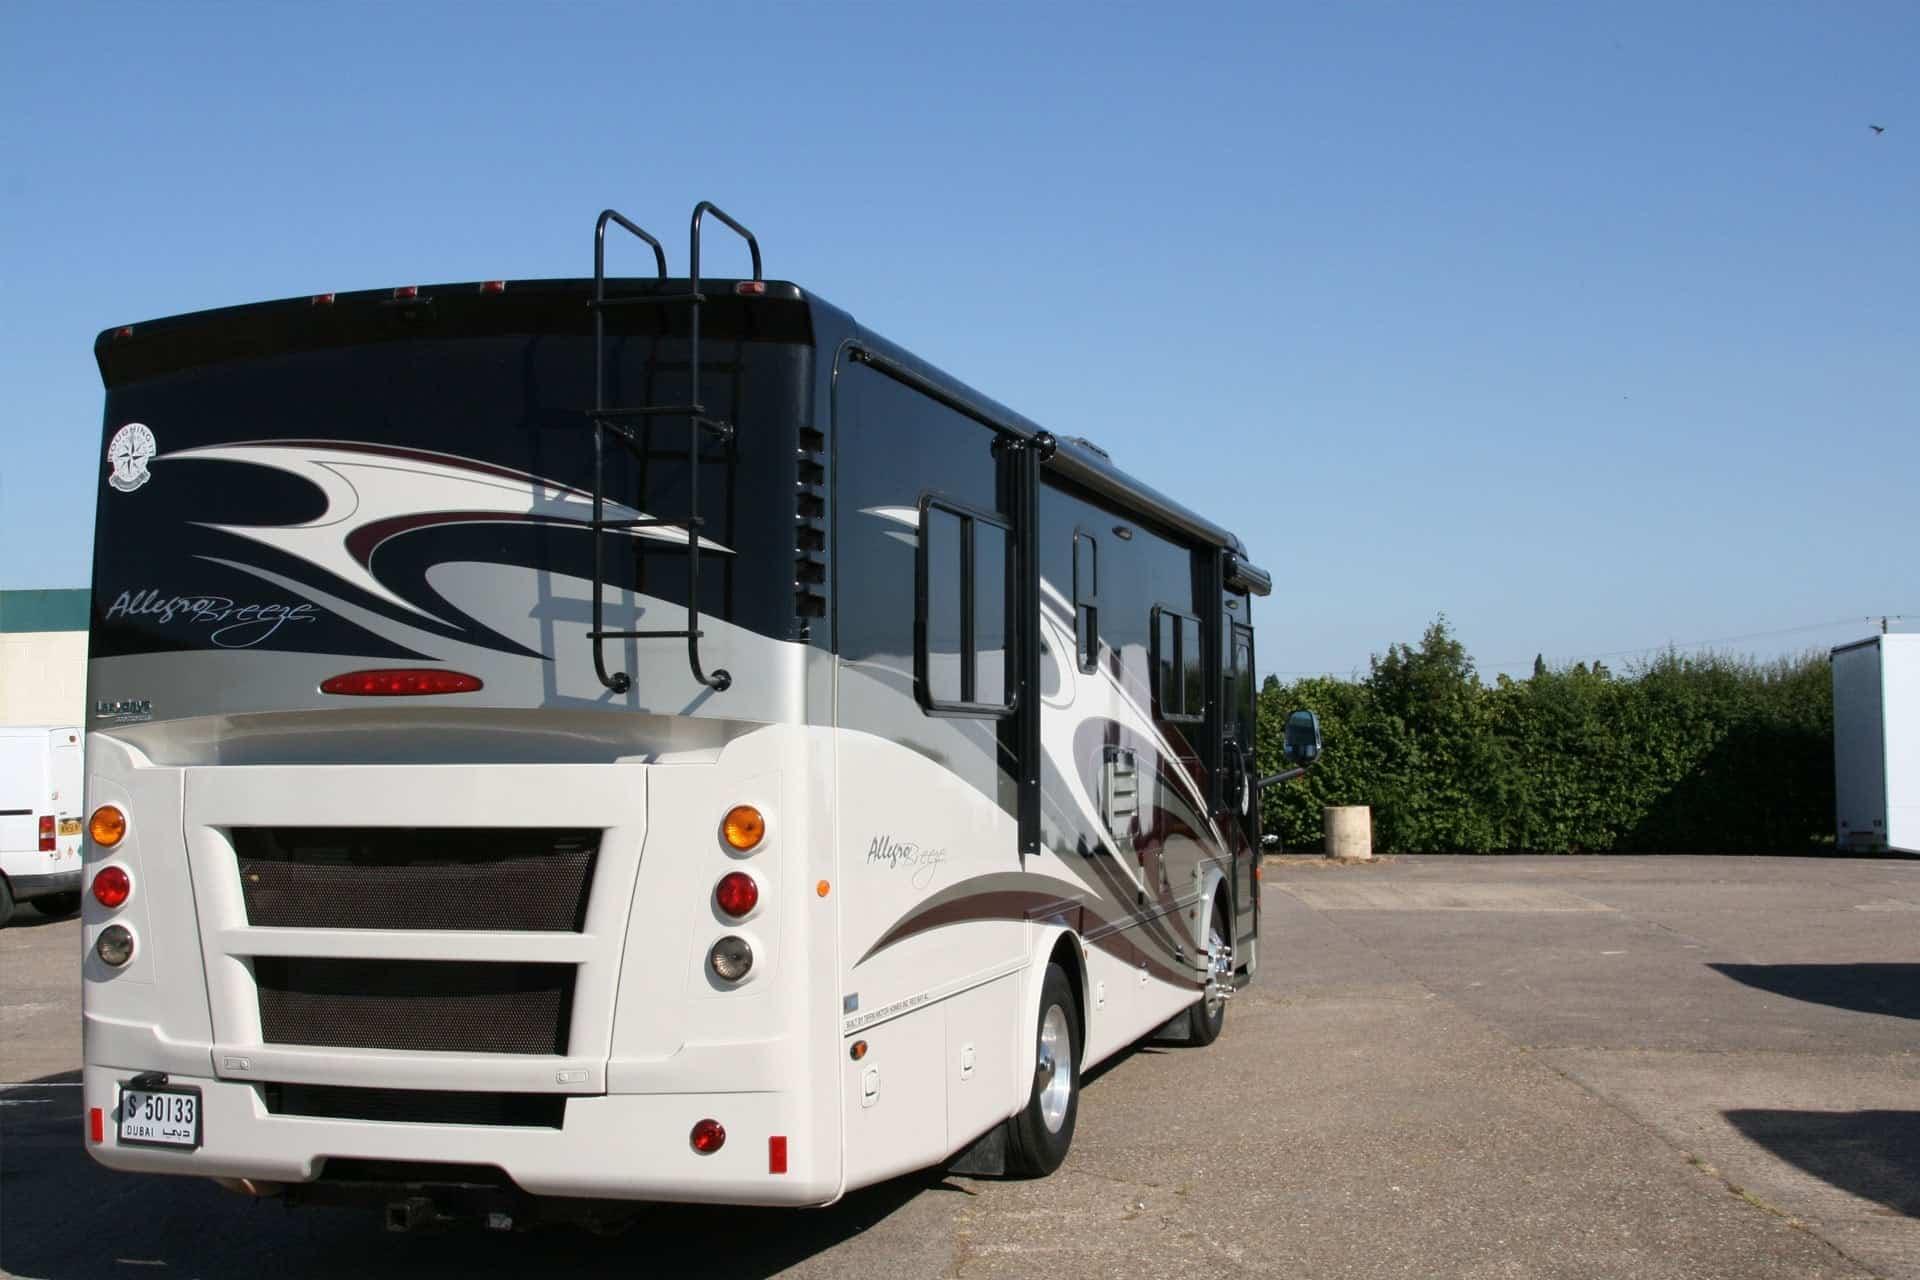 American RV Motorhome IVA Pass - LAS Motorhomes